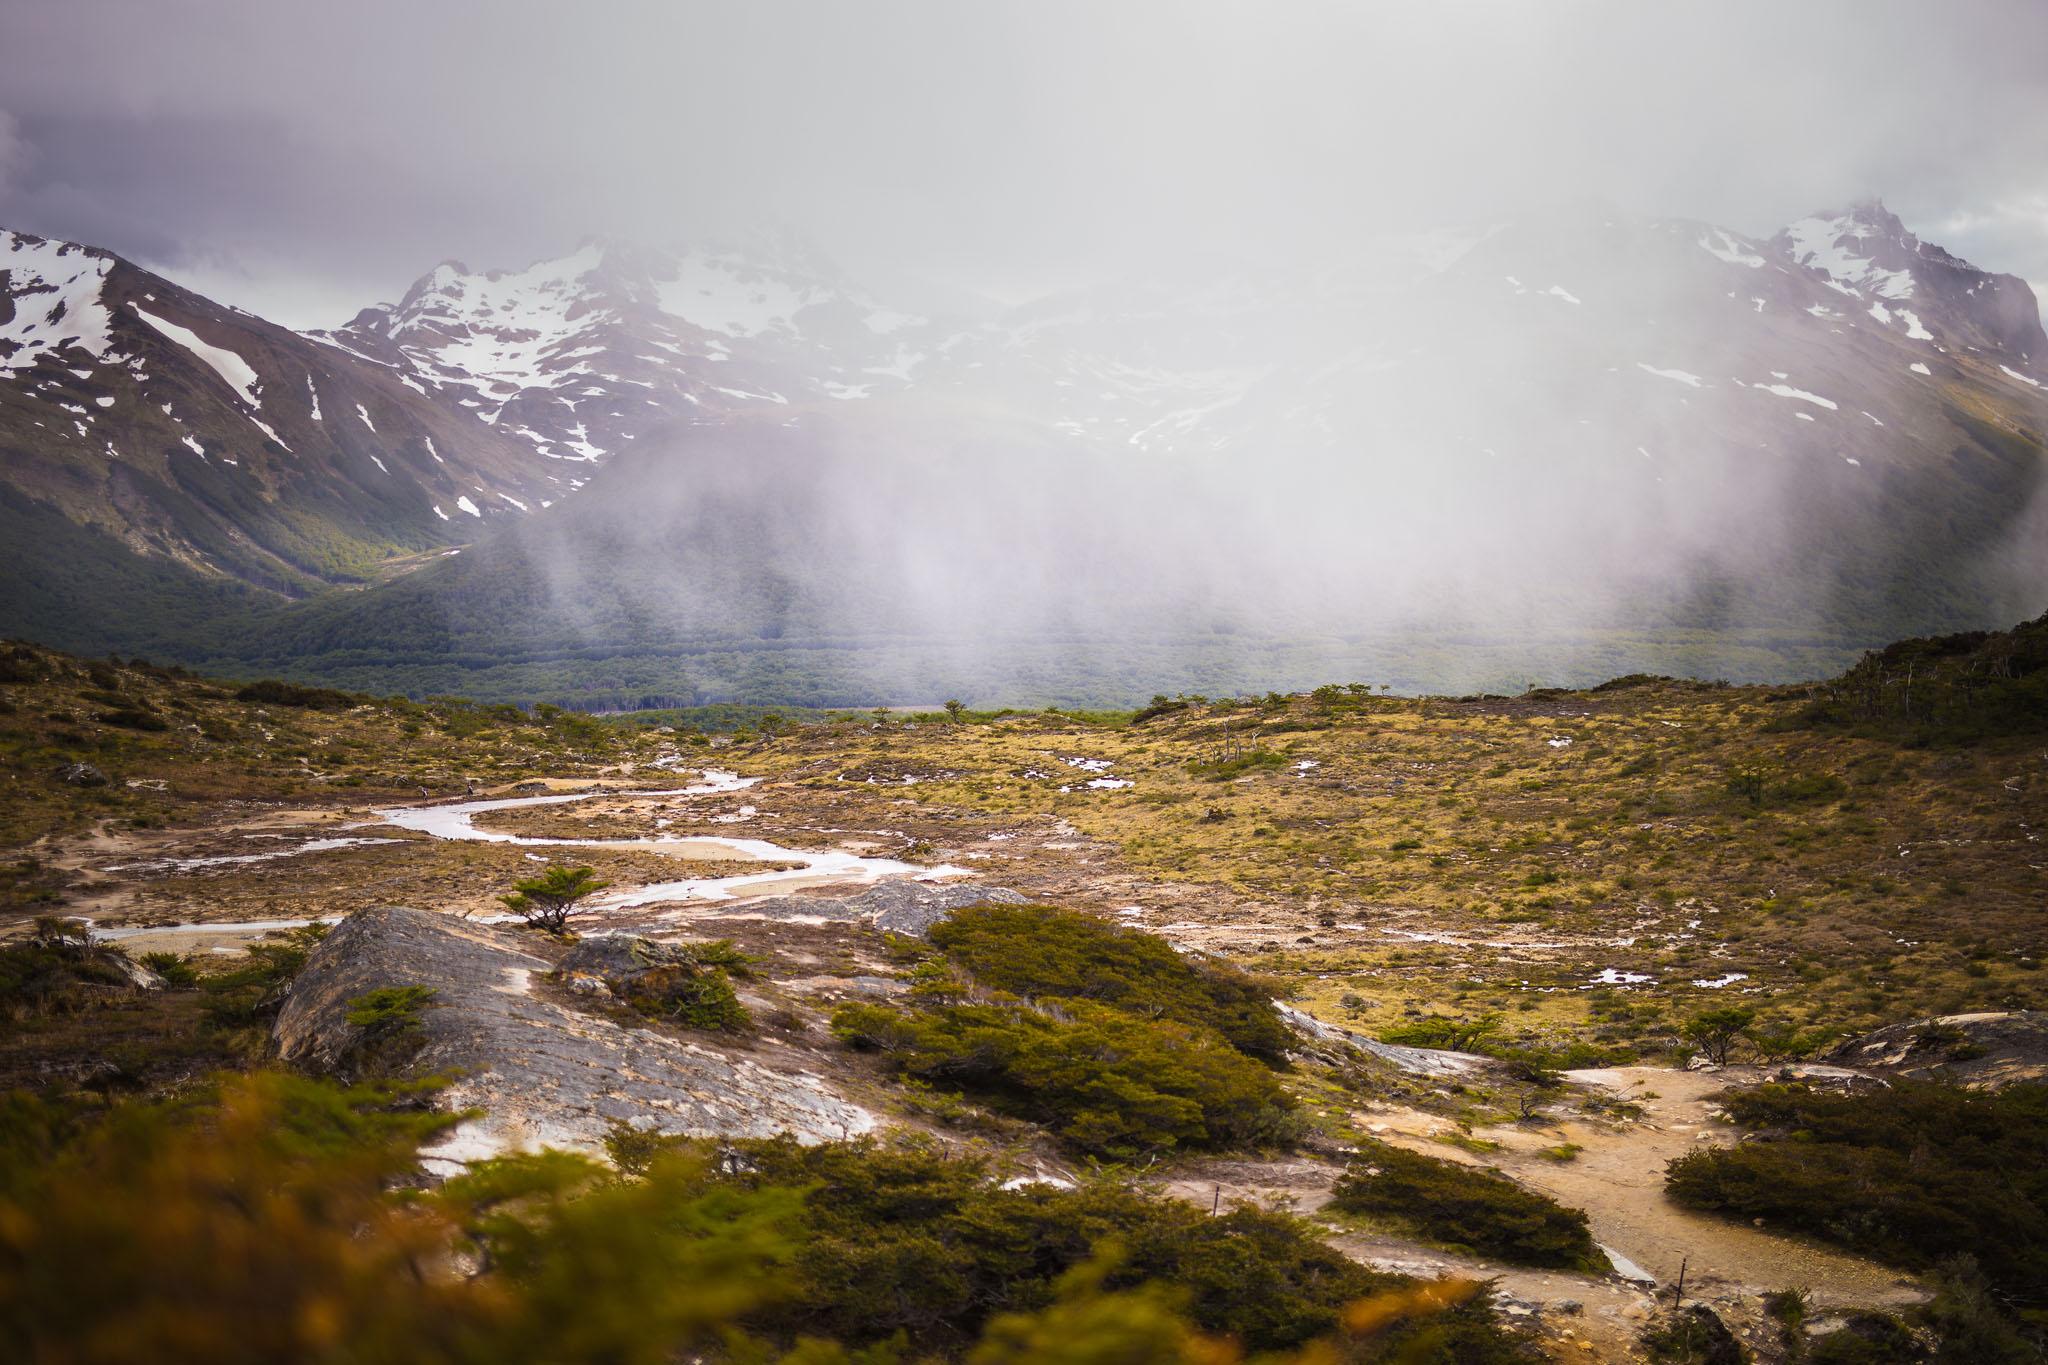 Wedding-travellers-ushuaia-argentina-laguna-esmeralda-mist-mountain